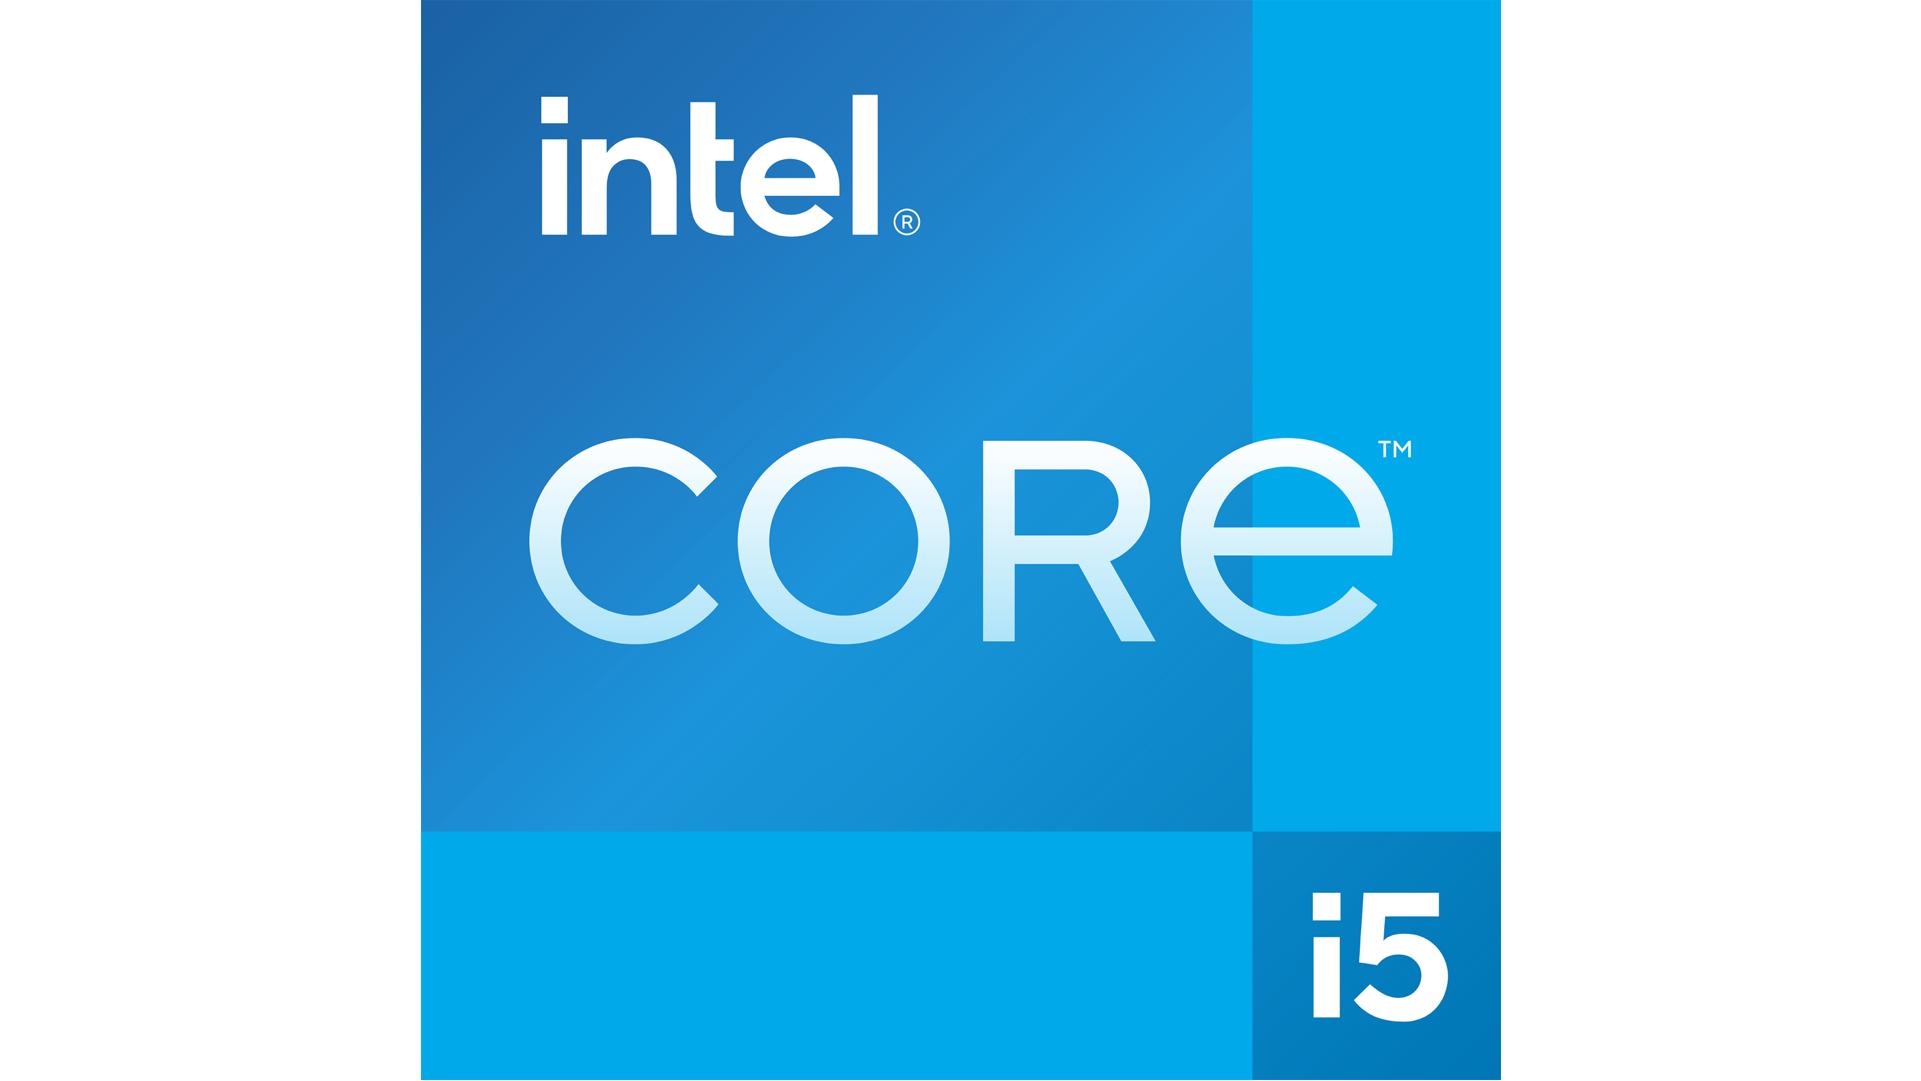 Intel Core i5 11500 - 2.7 GHz - 6 Kerne - 12 Threads